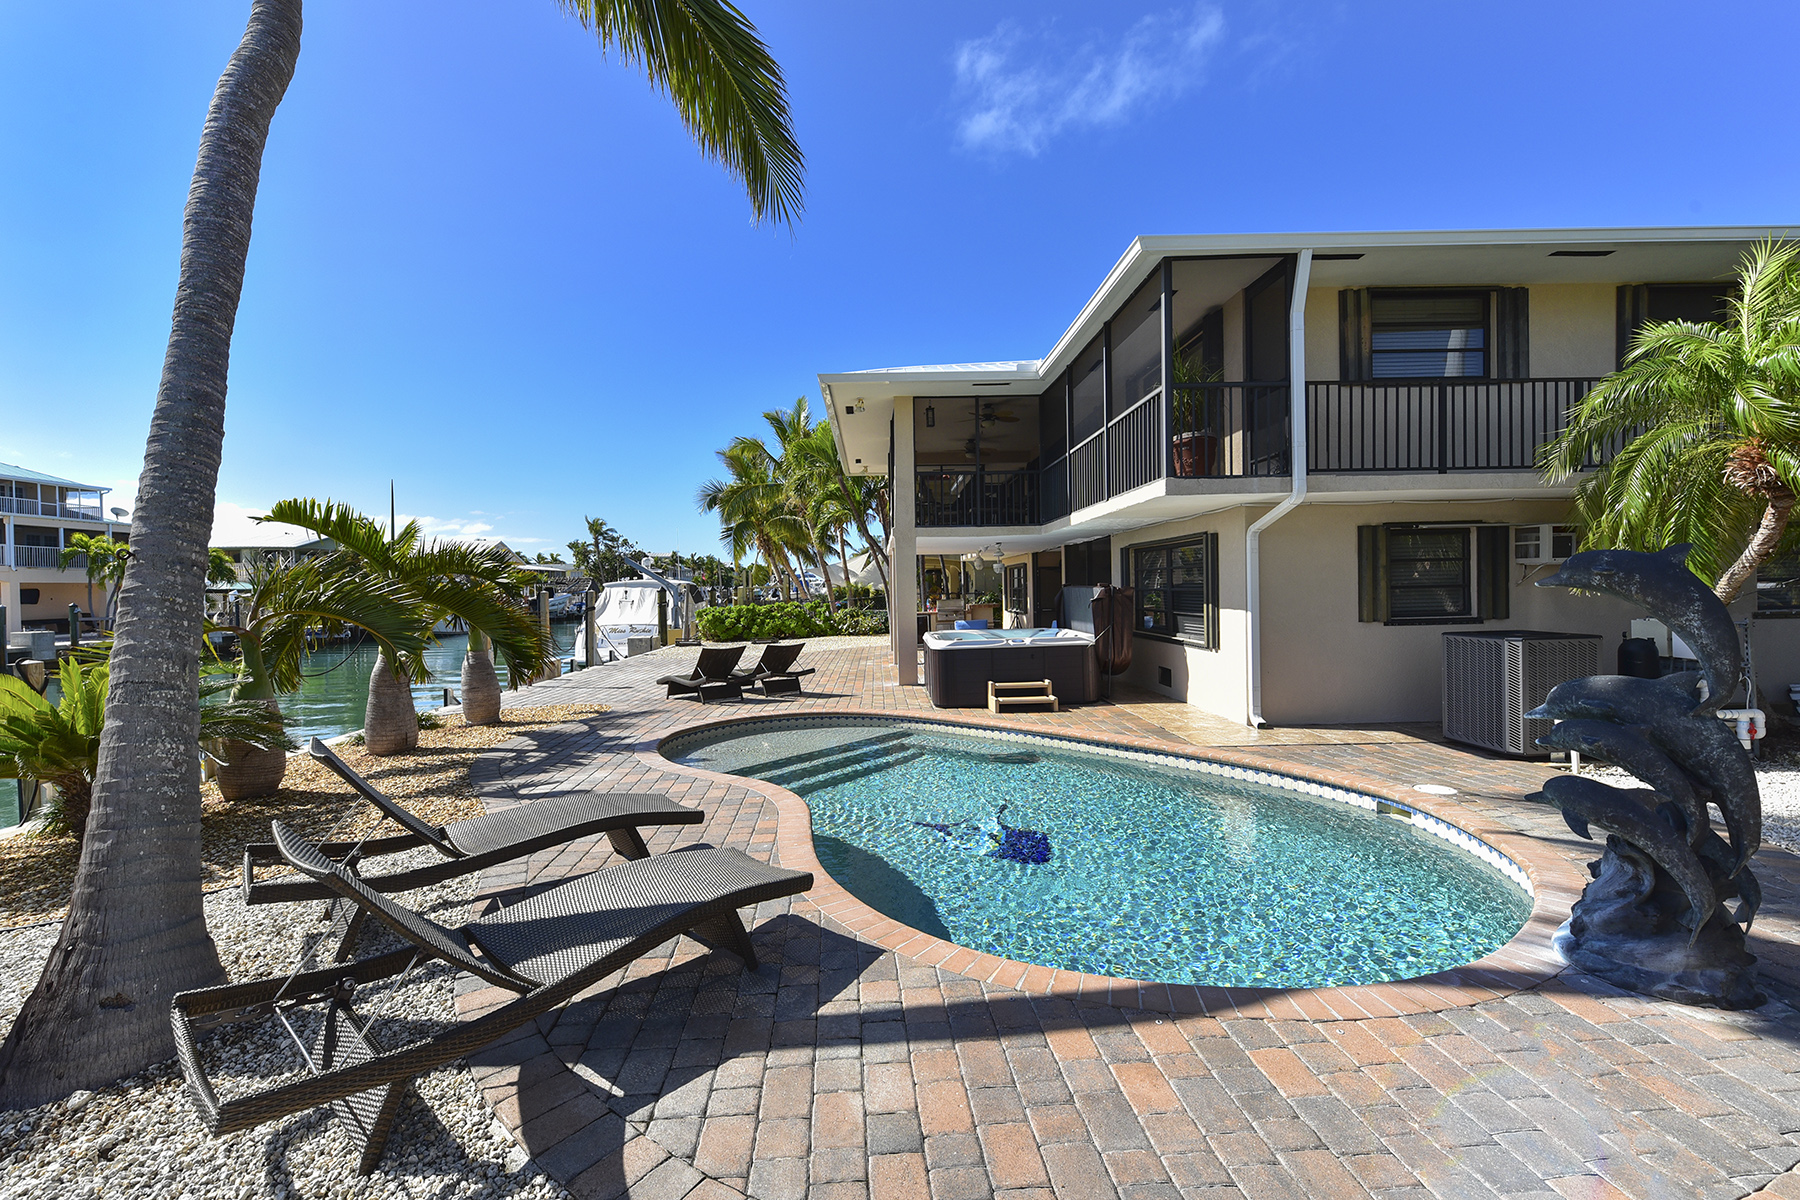 Single Family Home for Sale at Premier Waterfront Location 100 Severino Drive Islamorada, Florida 33036 United States